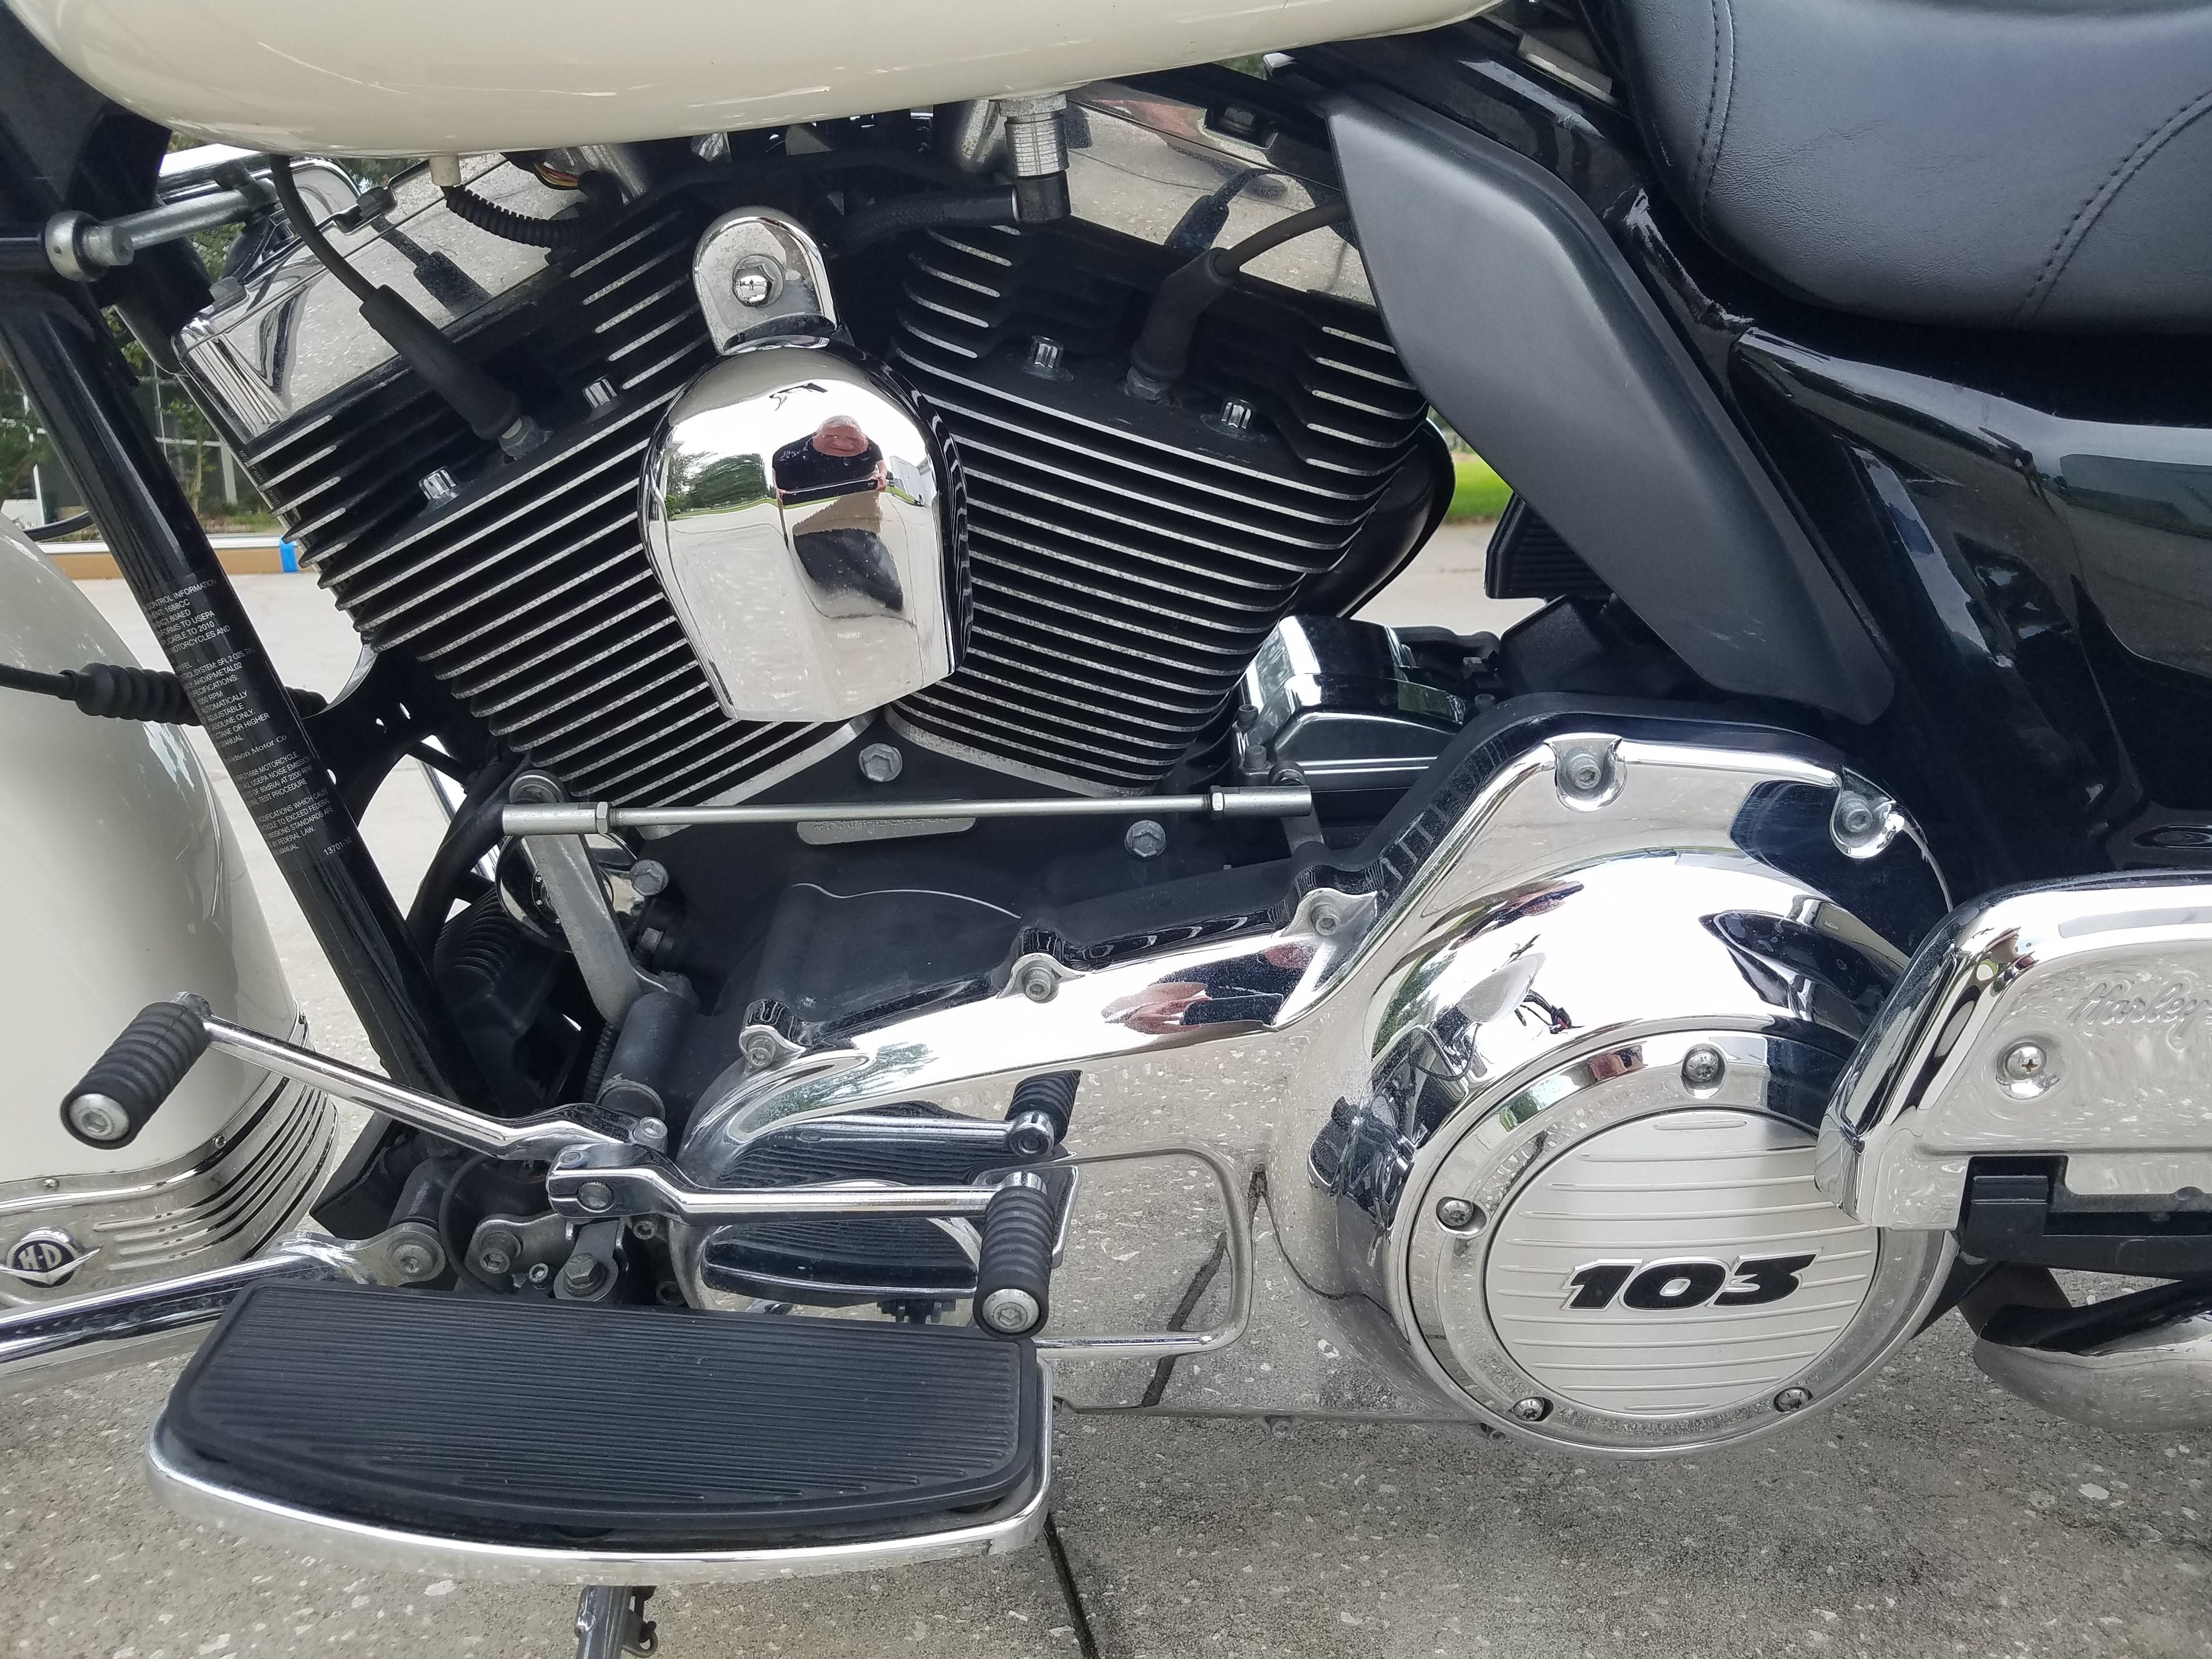 2010 Harley Davidson 174 Flhp Road King 174 Police White Lutz